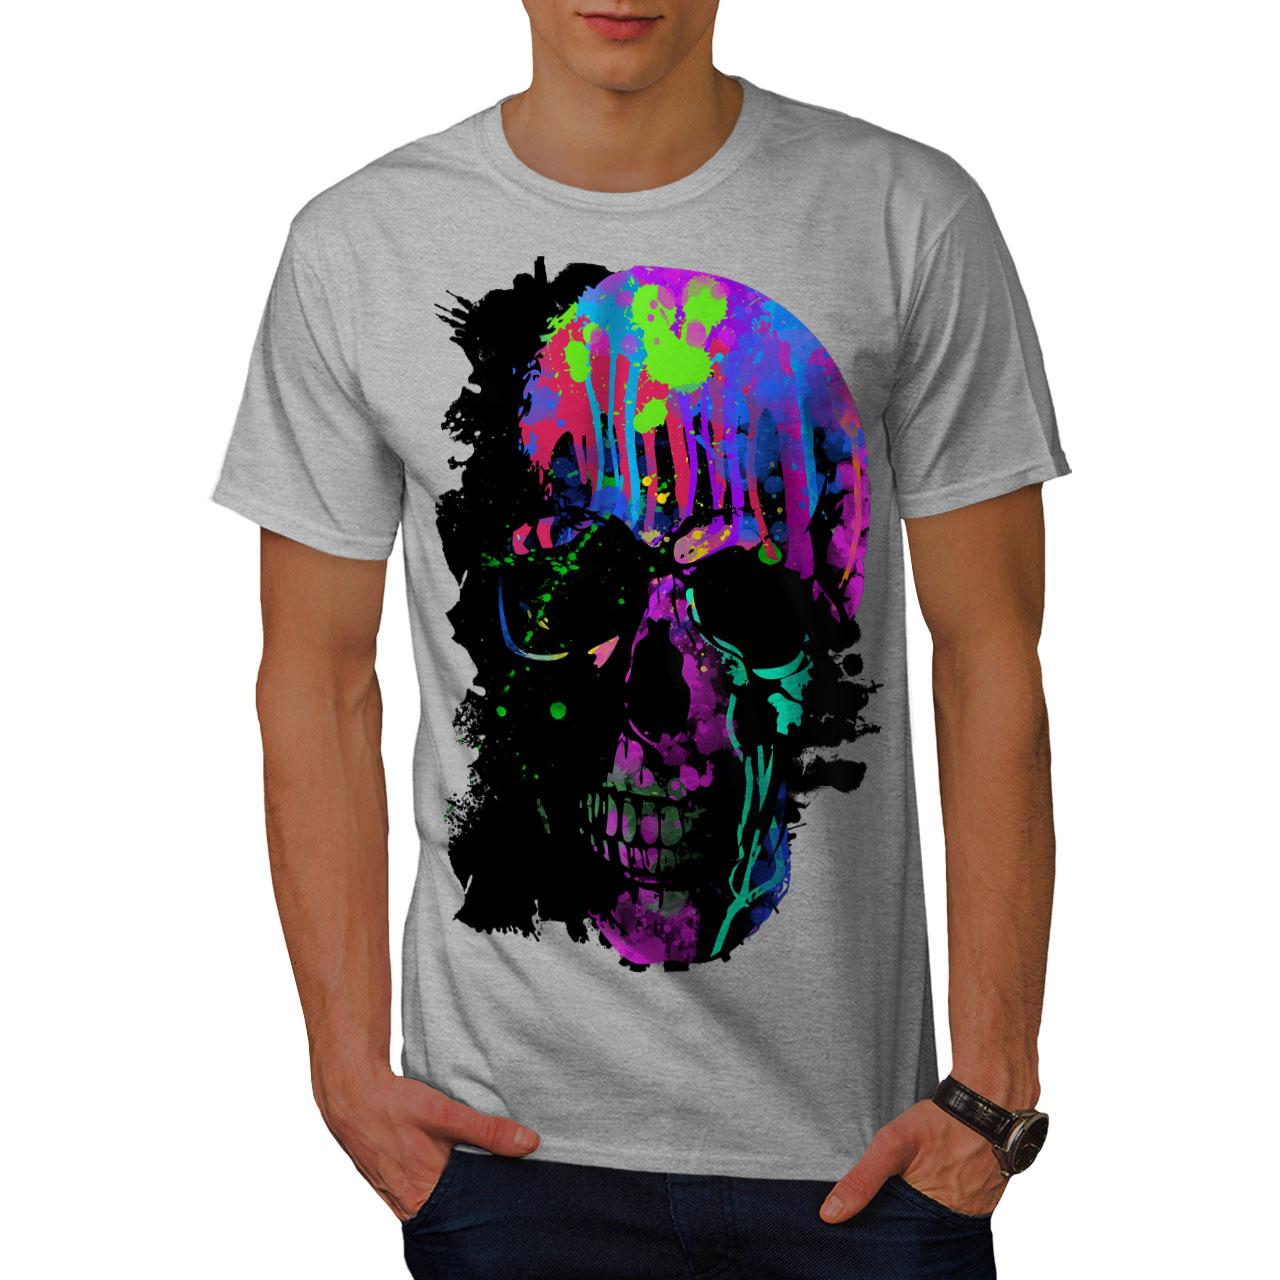 Wellcoda-Skull-Artsy-Mens-T-shirt-Neon-Night-Graphic-Design-Printed-Tee thumbnail 15